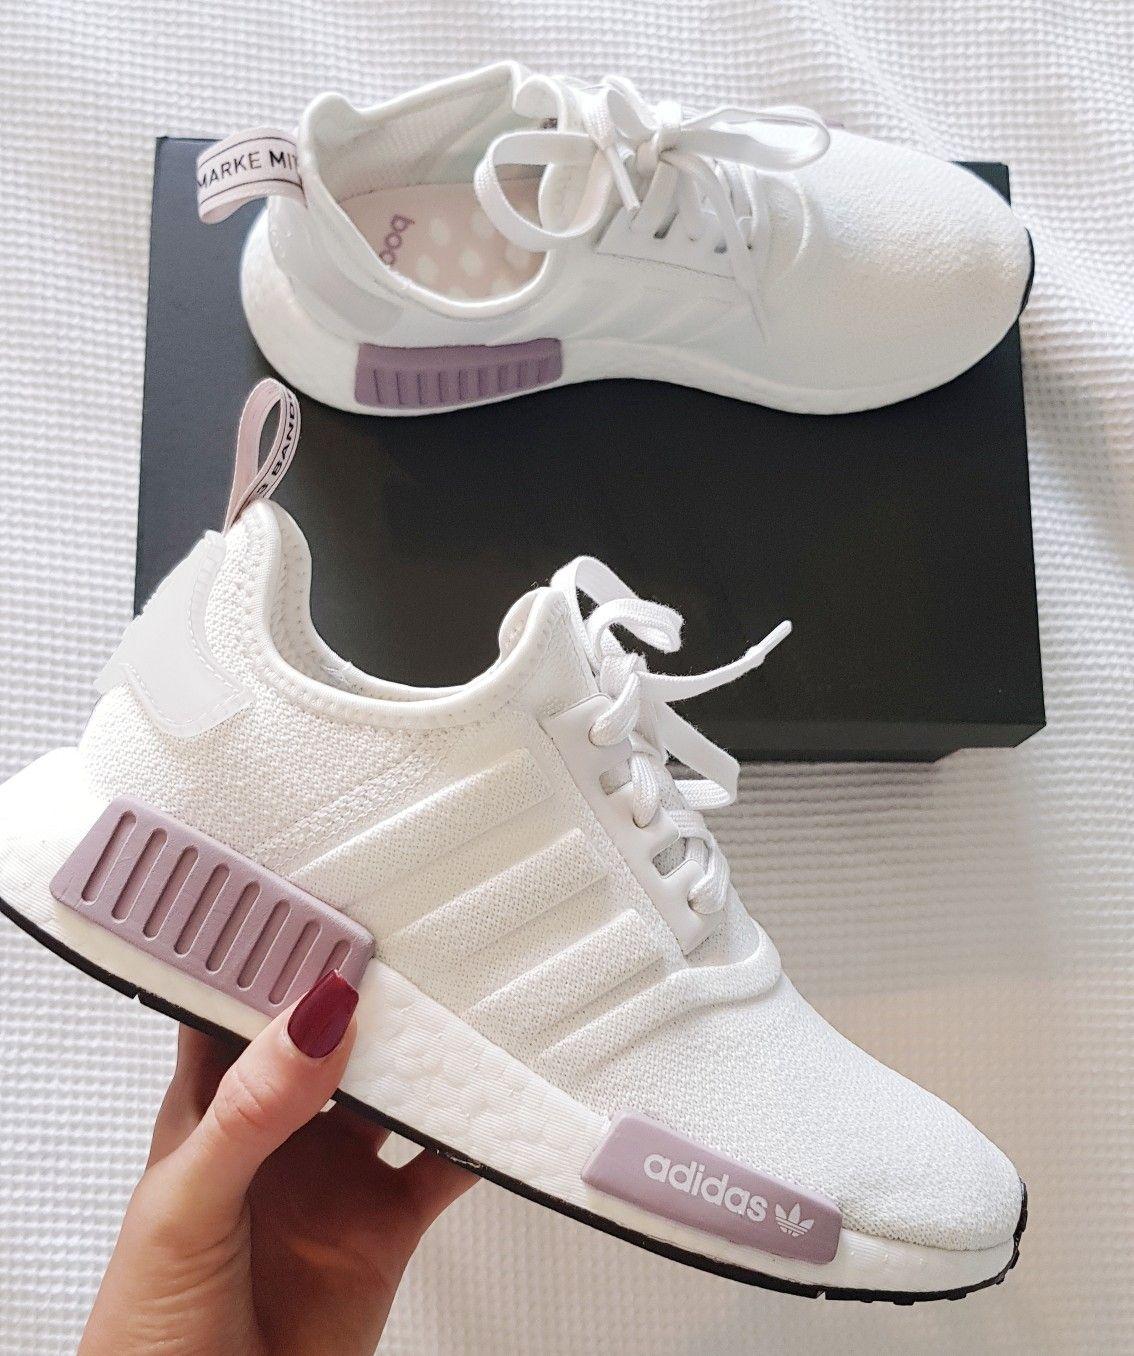 adidas laufschuhe schwarz pink color